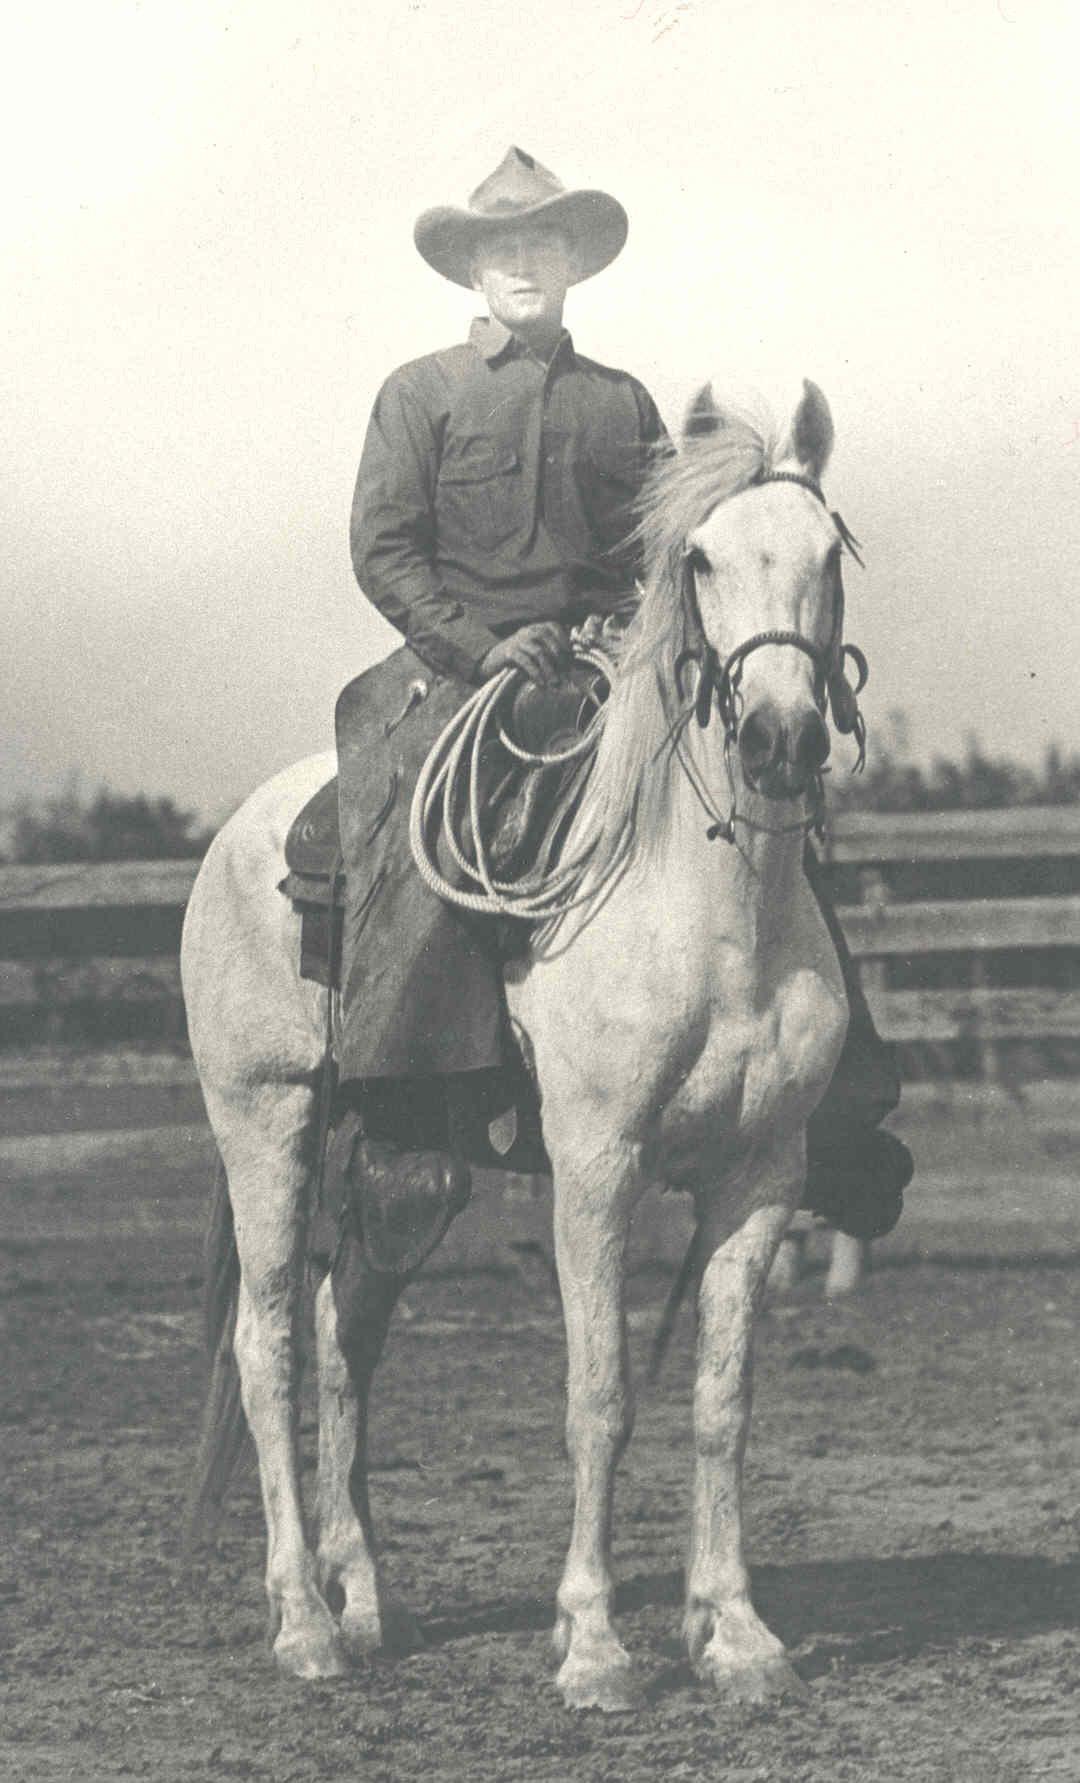 R.A. Brown on Whiteman